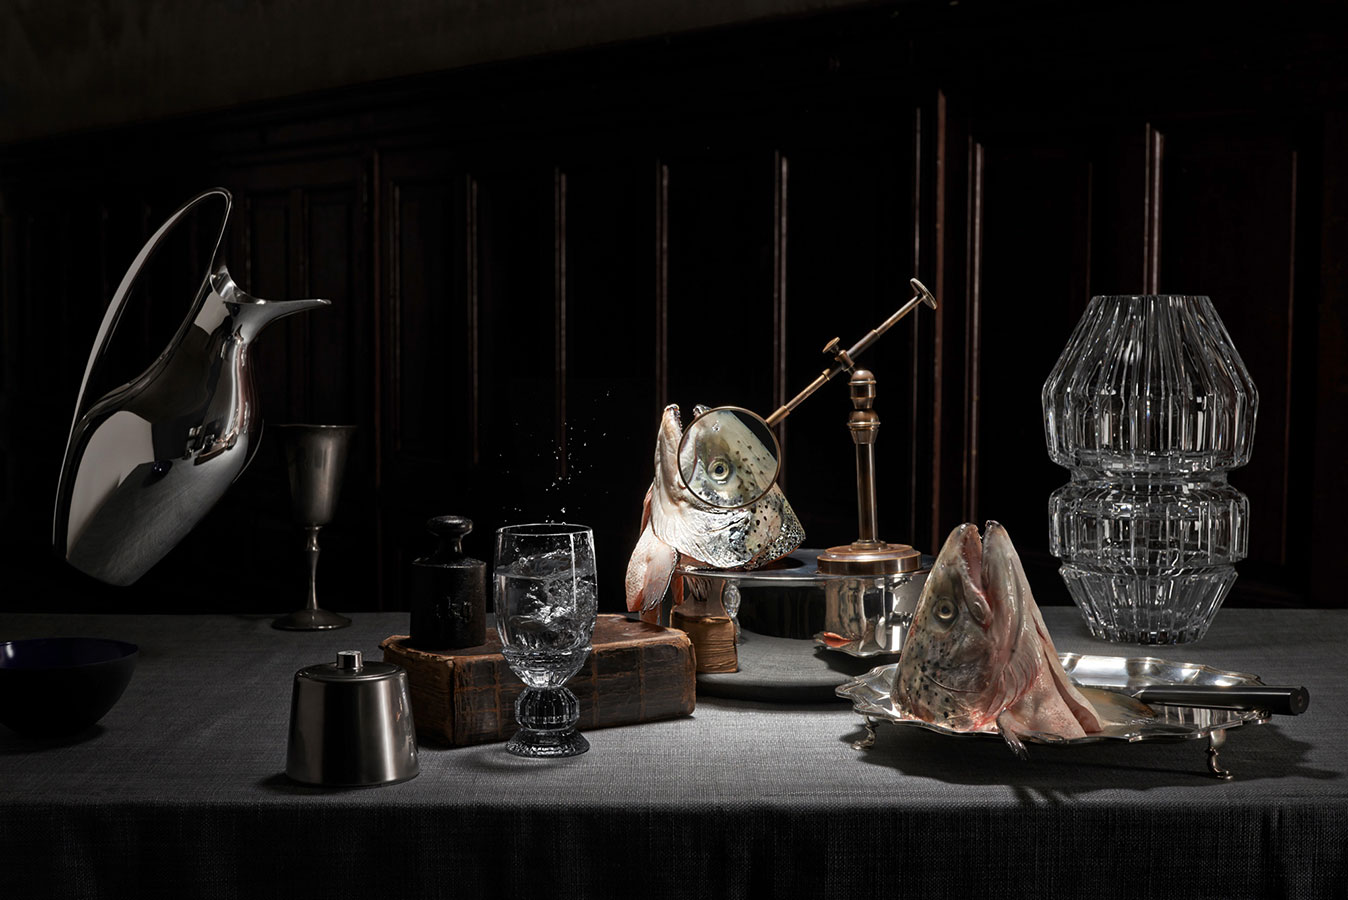 stills simone rosenberg. Black Bedroom Furniture Sets. Home Design Ideas